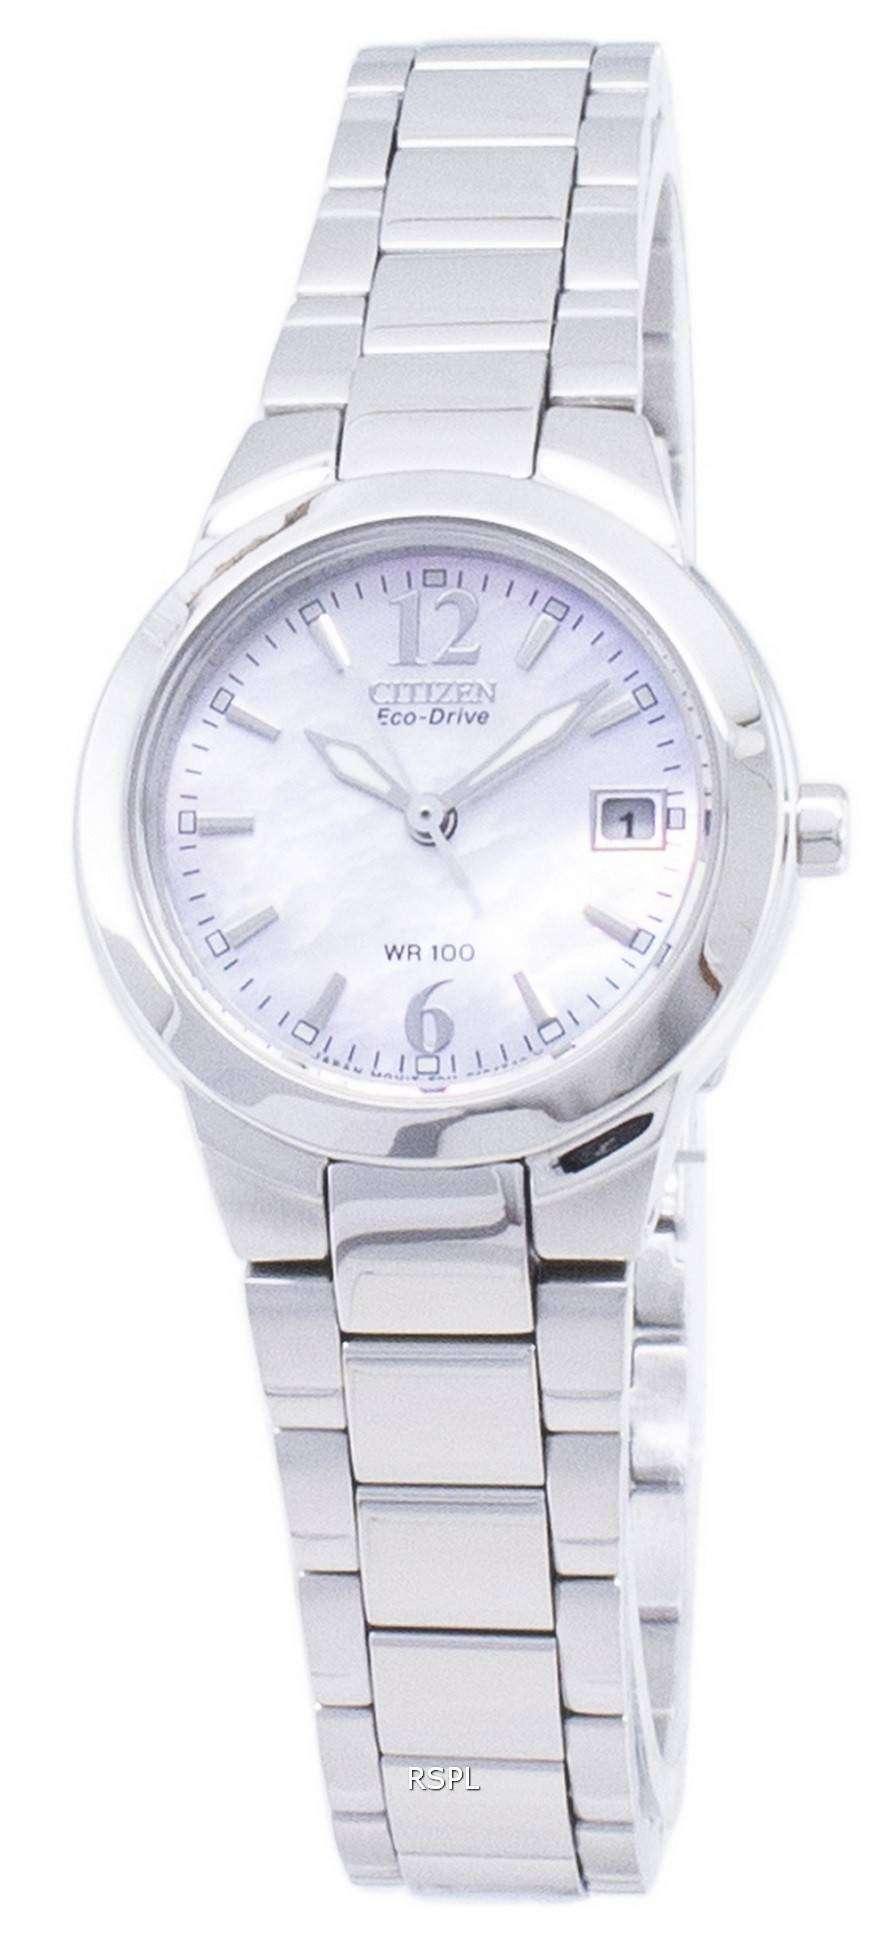 Citizen 시티즌 시계 실루엣 에코 드라이브 EW1670-59D 아날로그 여성용 손목시계